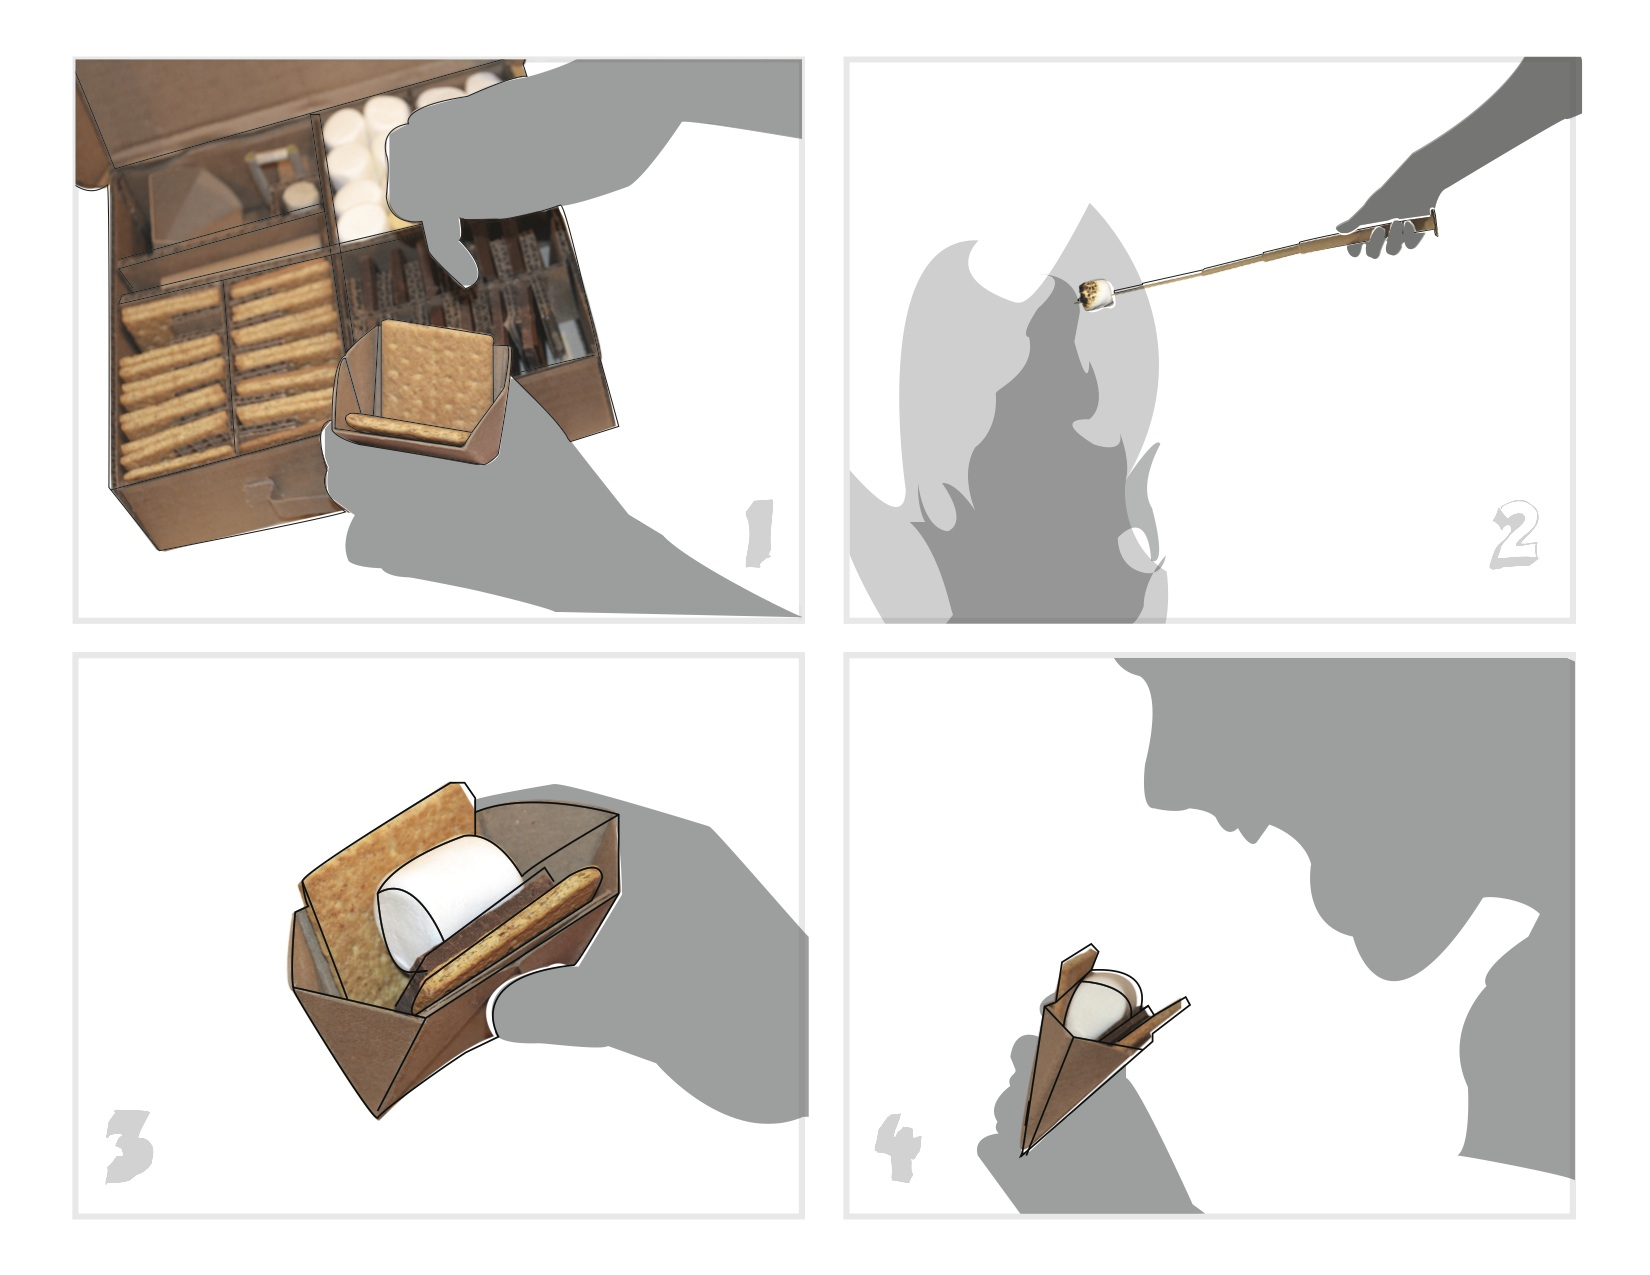 smores+storyboard.jpg